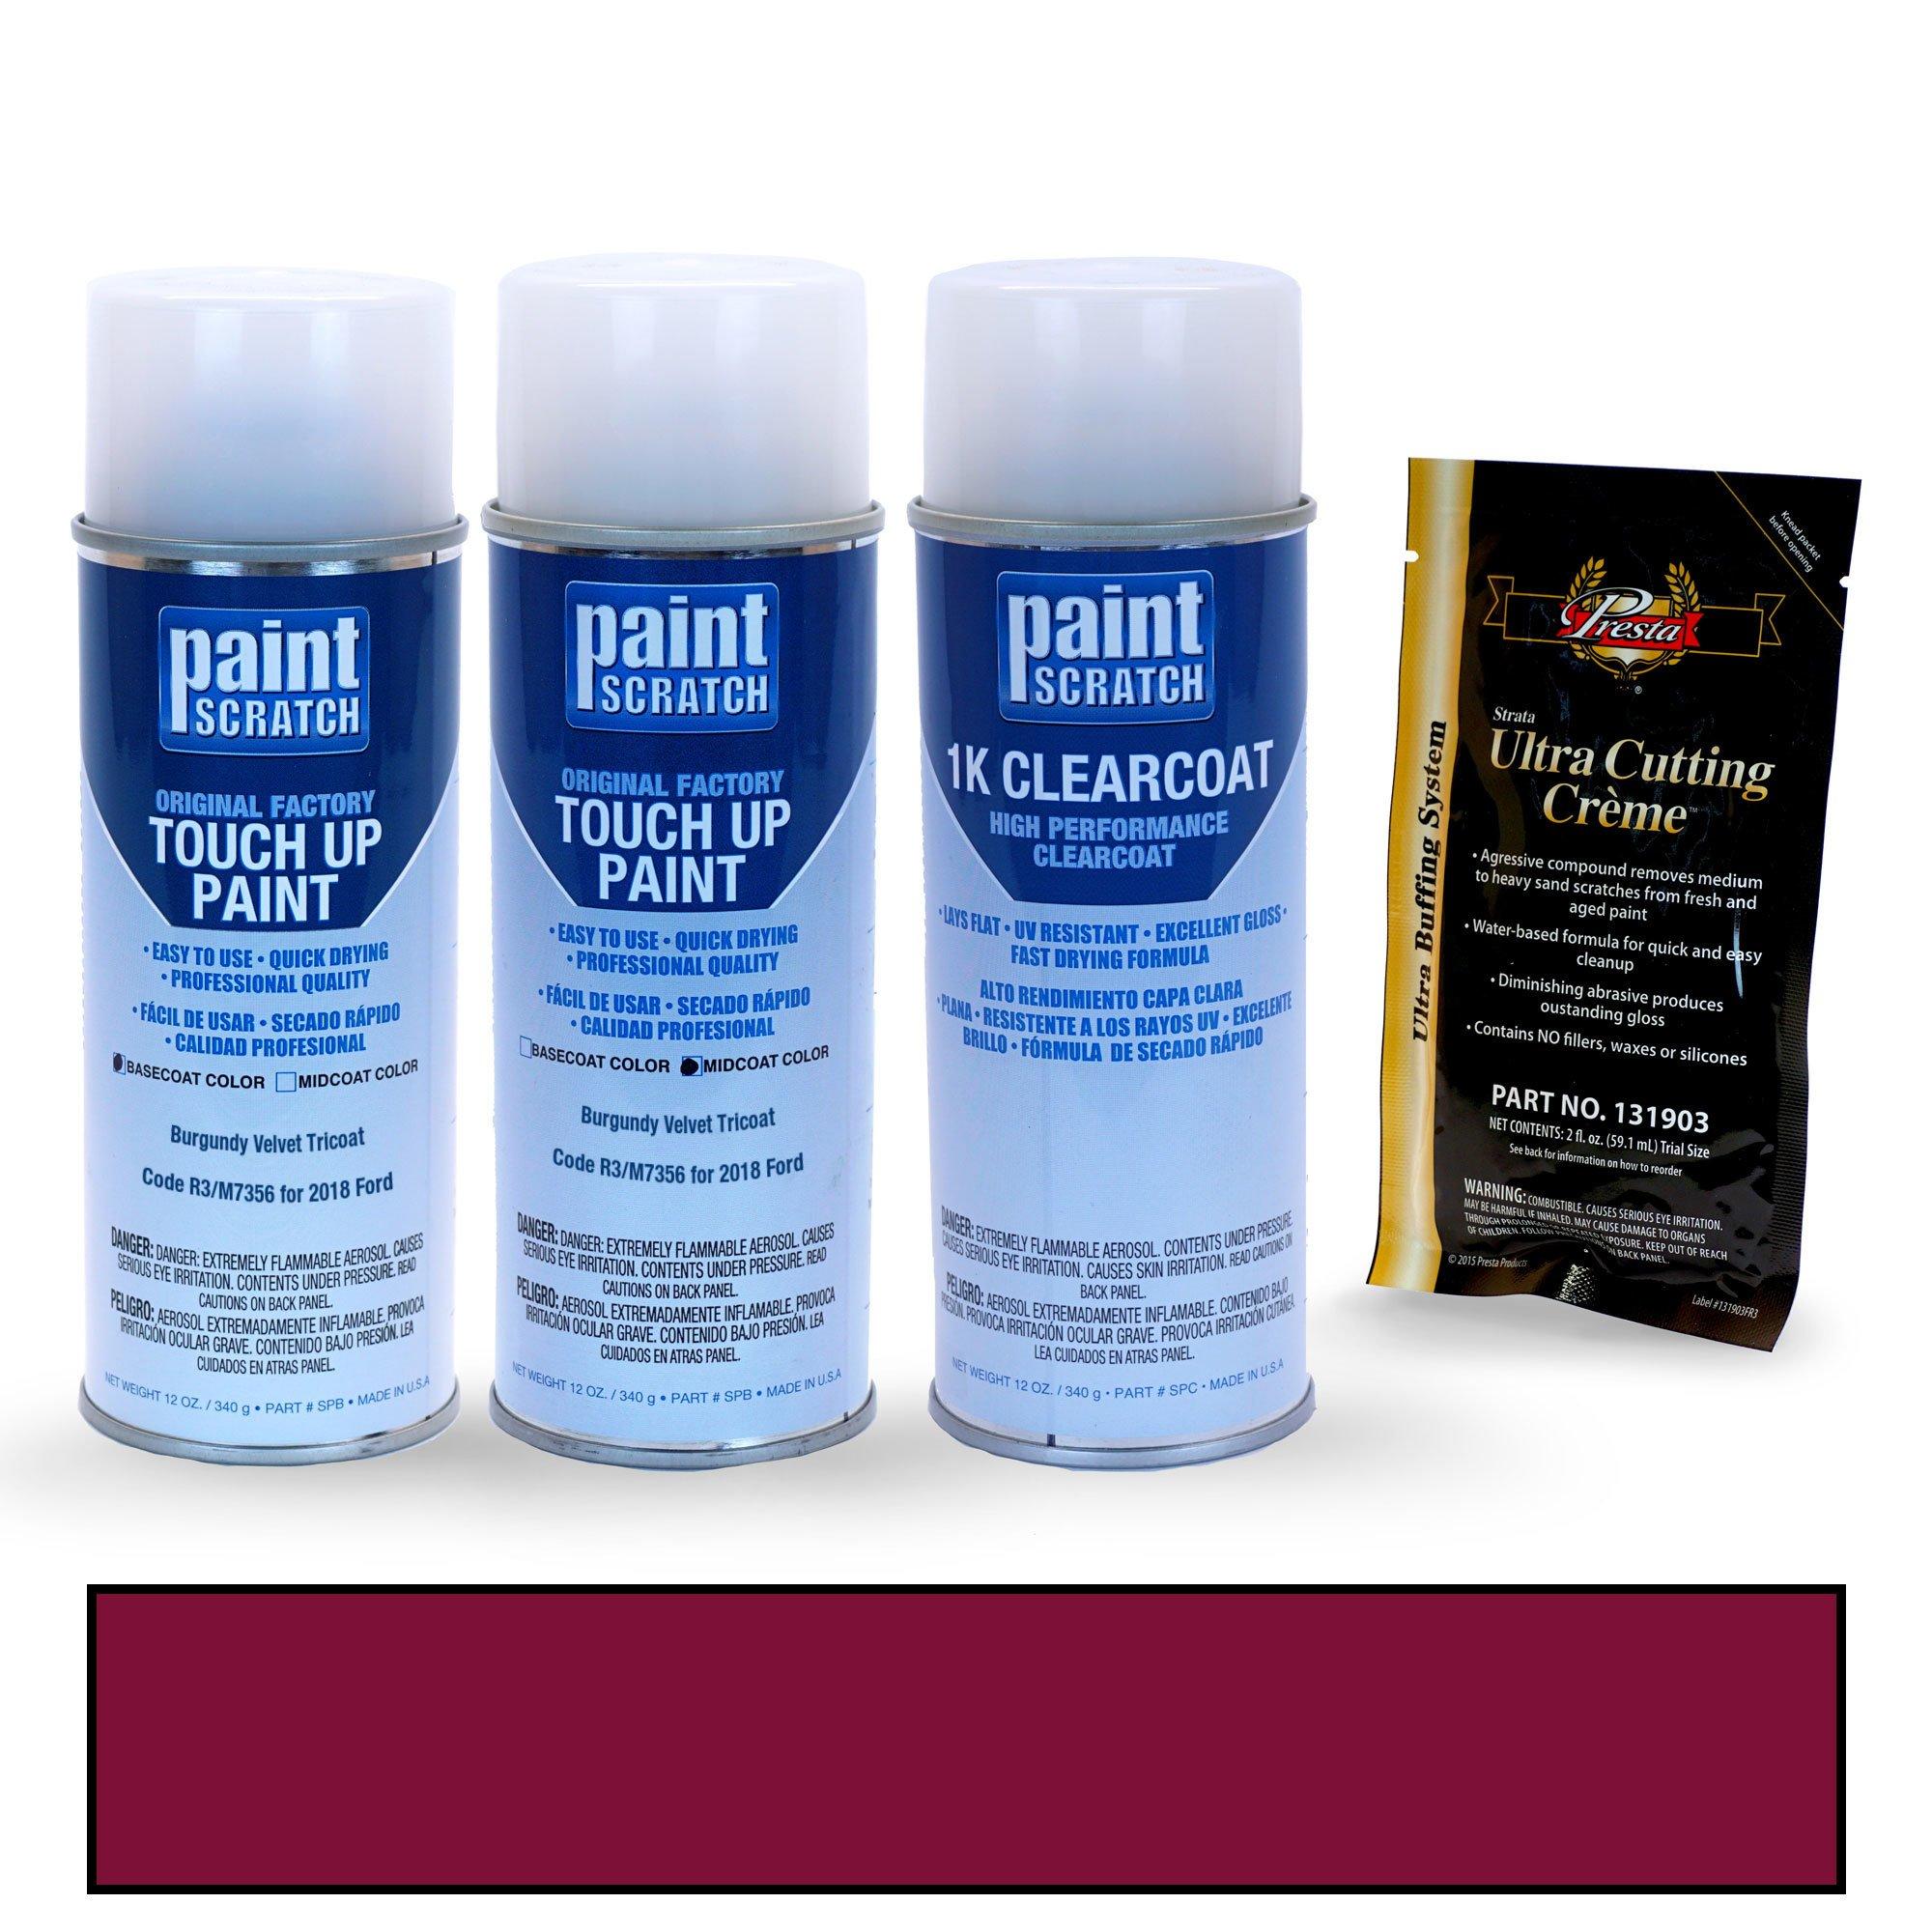 PAINTSCRATCH Burgundy Velvet Tricoat R3/M7356 for 2018 Ford EcoSport - Touch Up Paint Spray Can Kit - Original Factory OEM Automotive Paint - Color Match Guaranteed